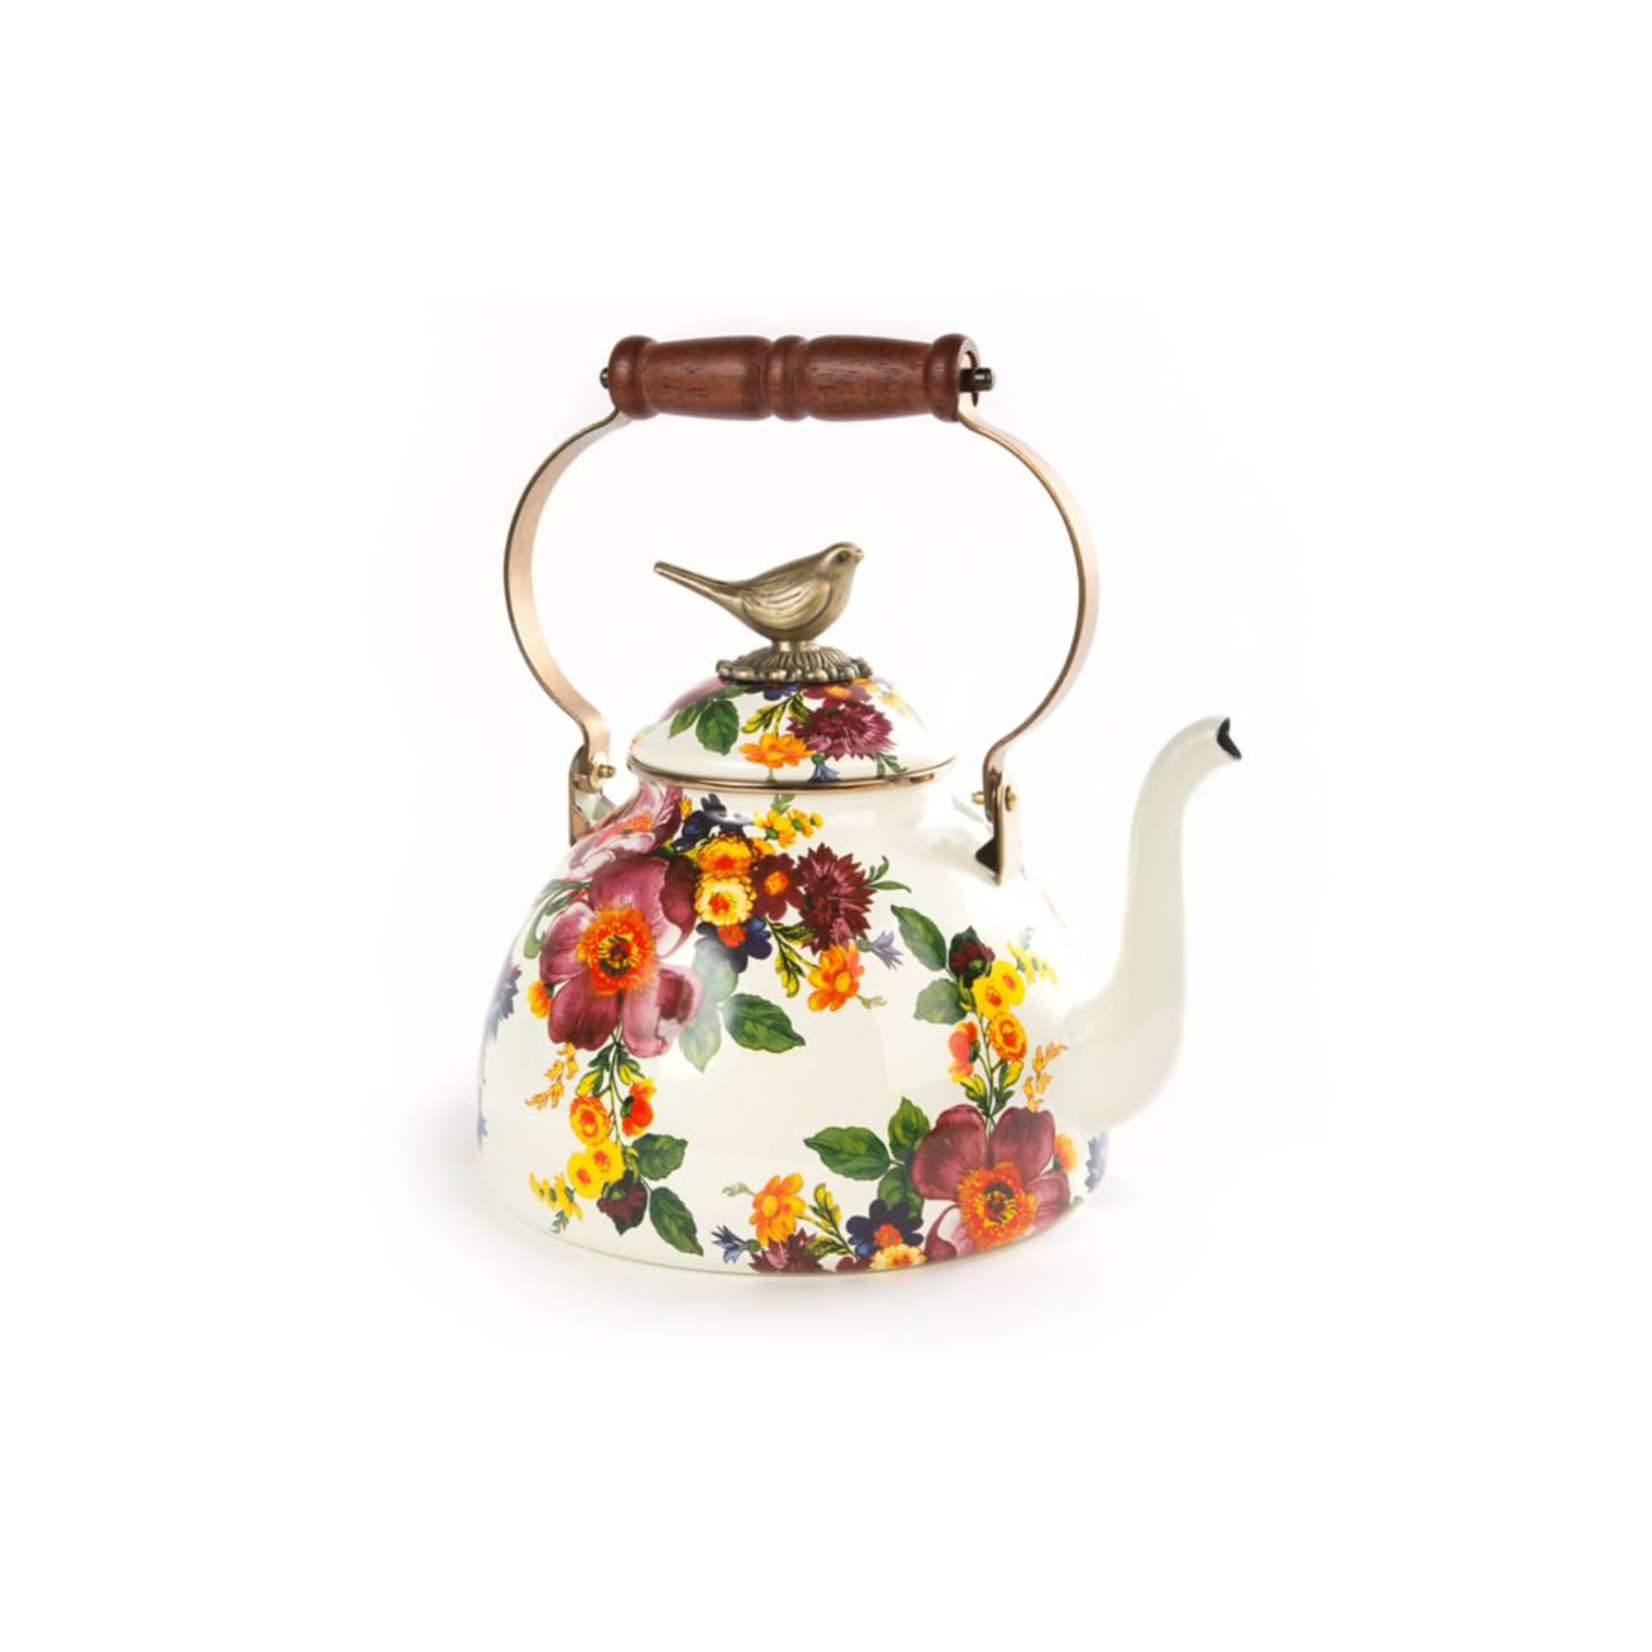 MacKenzie Childs Flower Market 3 QT Tea Kettle with bird